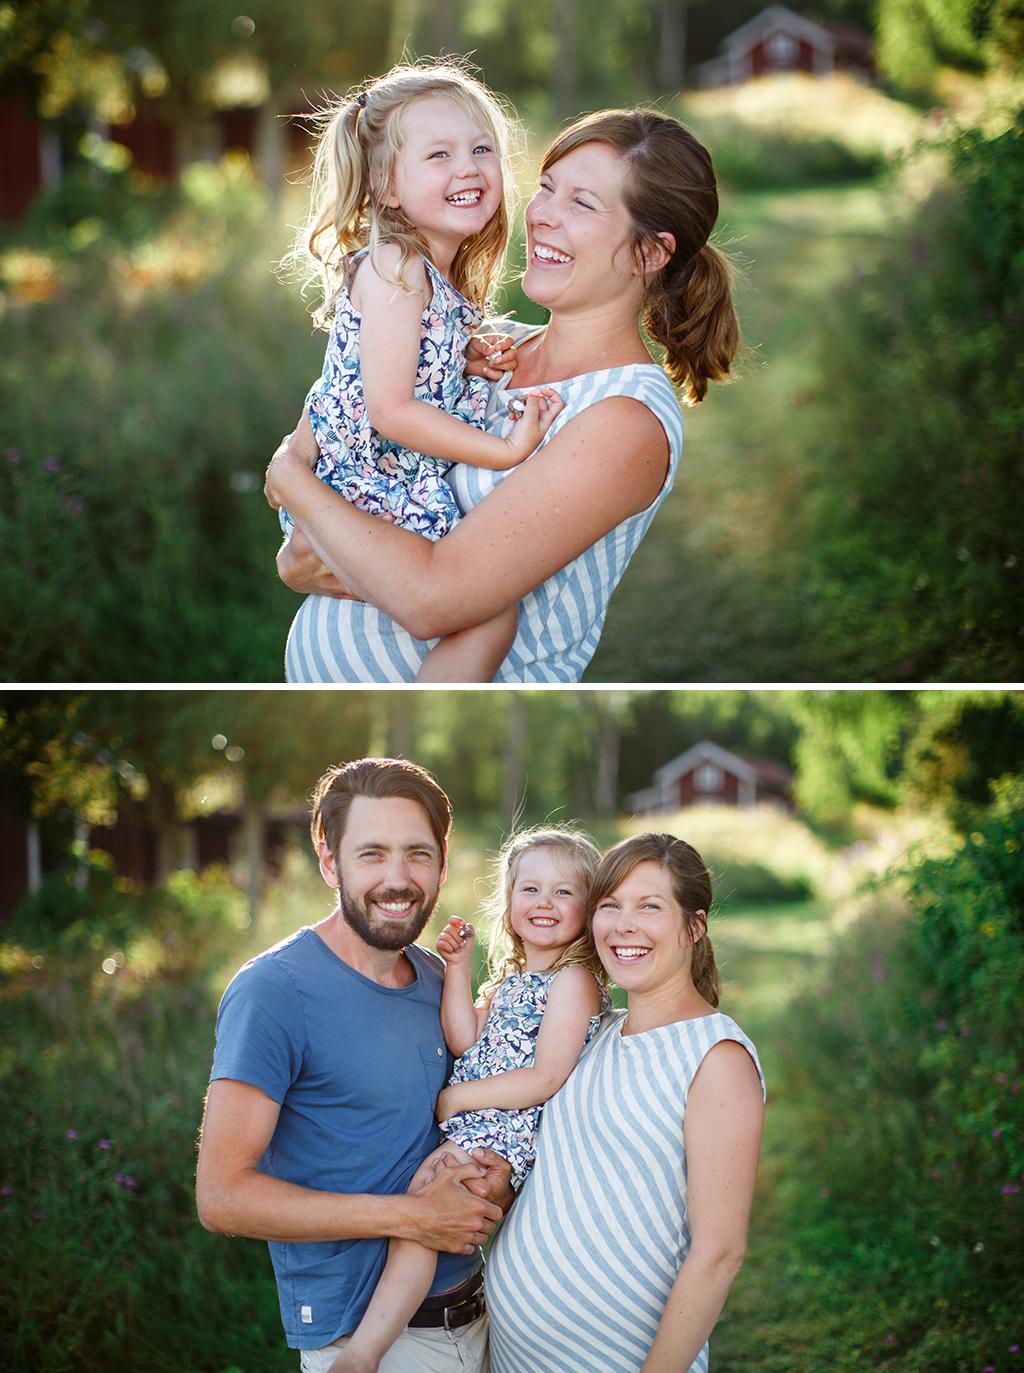 Lifestyle-familjefotografering_Familjefotograf-Anna-Sandstrom-88.jpg